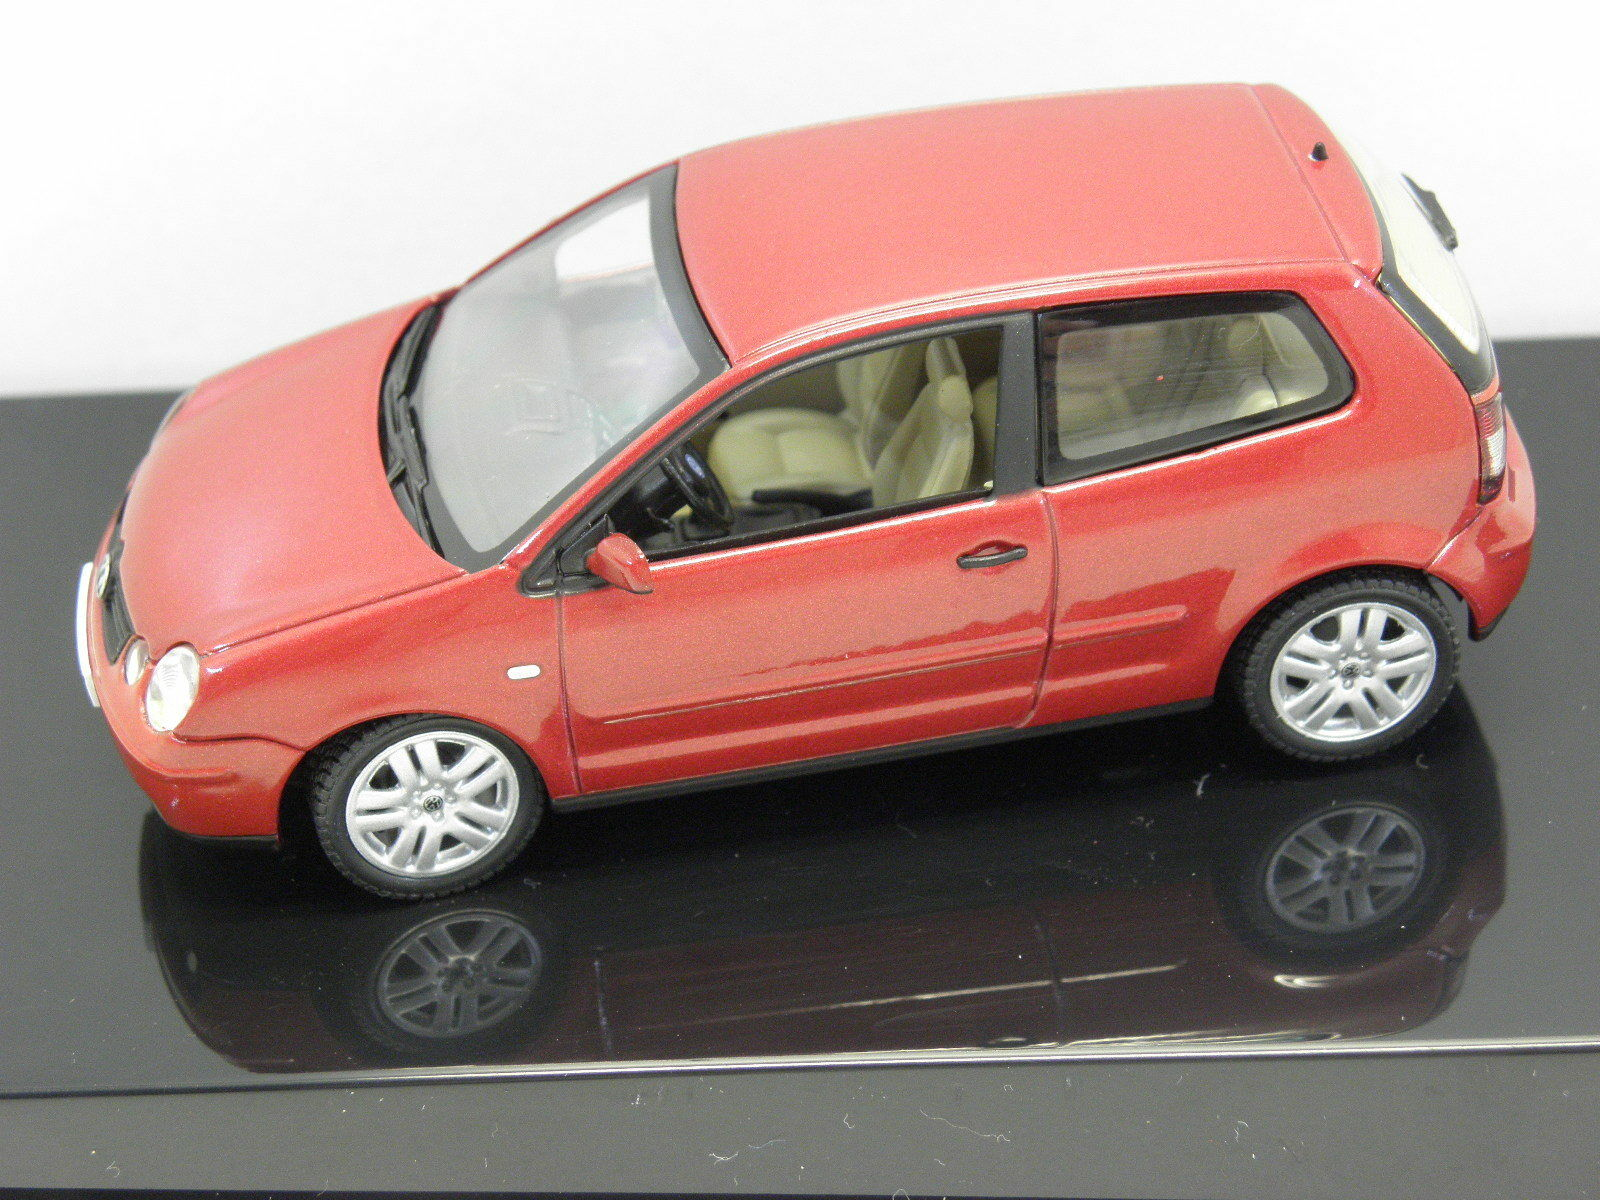 Autoart 59767 stand modelo vw polo polo polo 2001 (muranorojo perleffekt) escala 1 43 525b3d